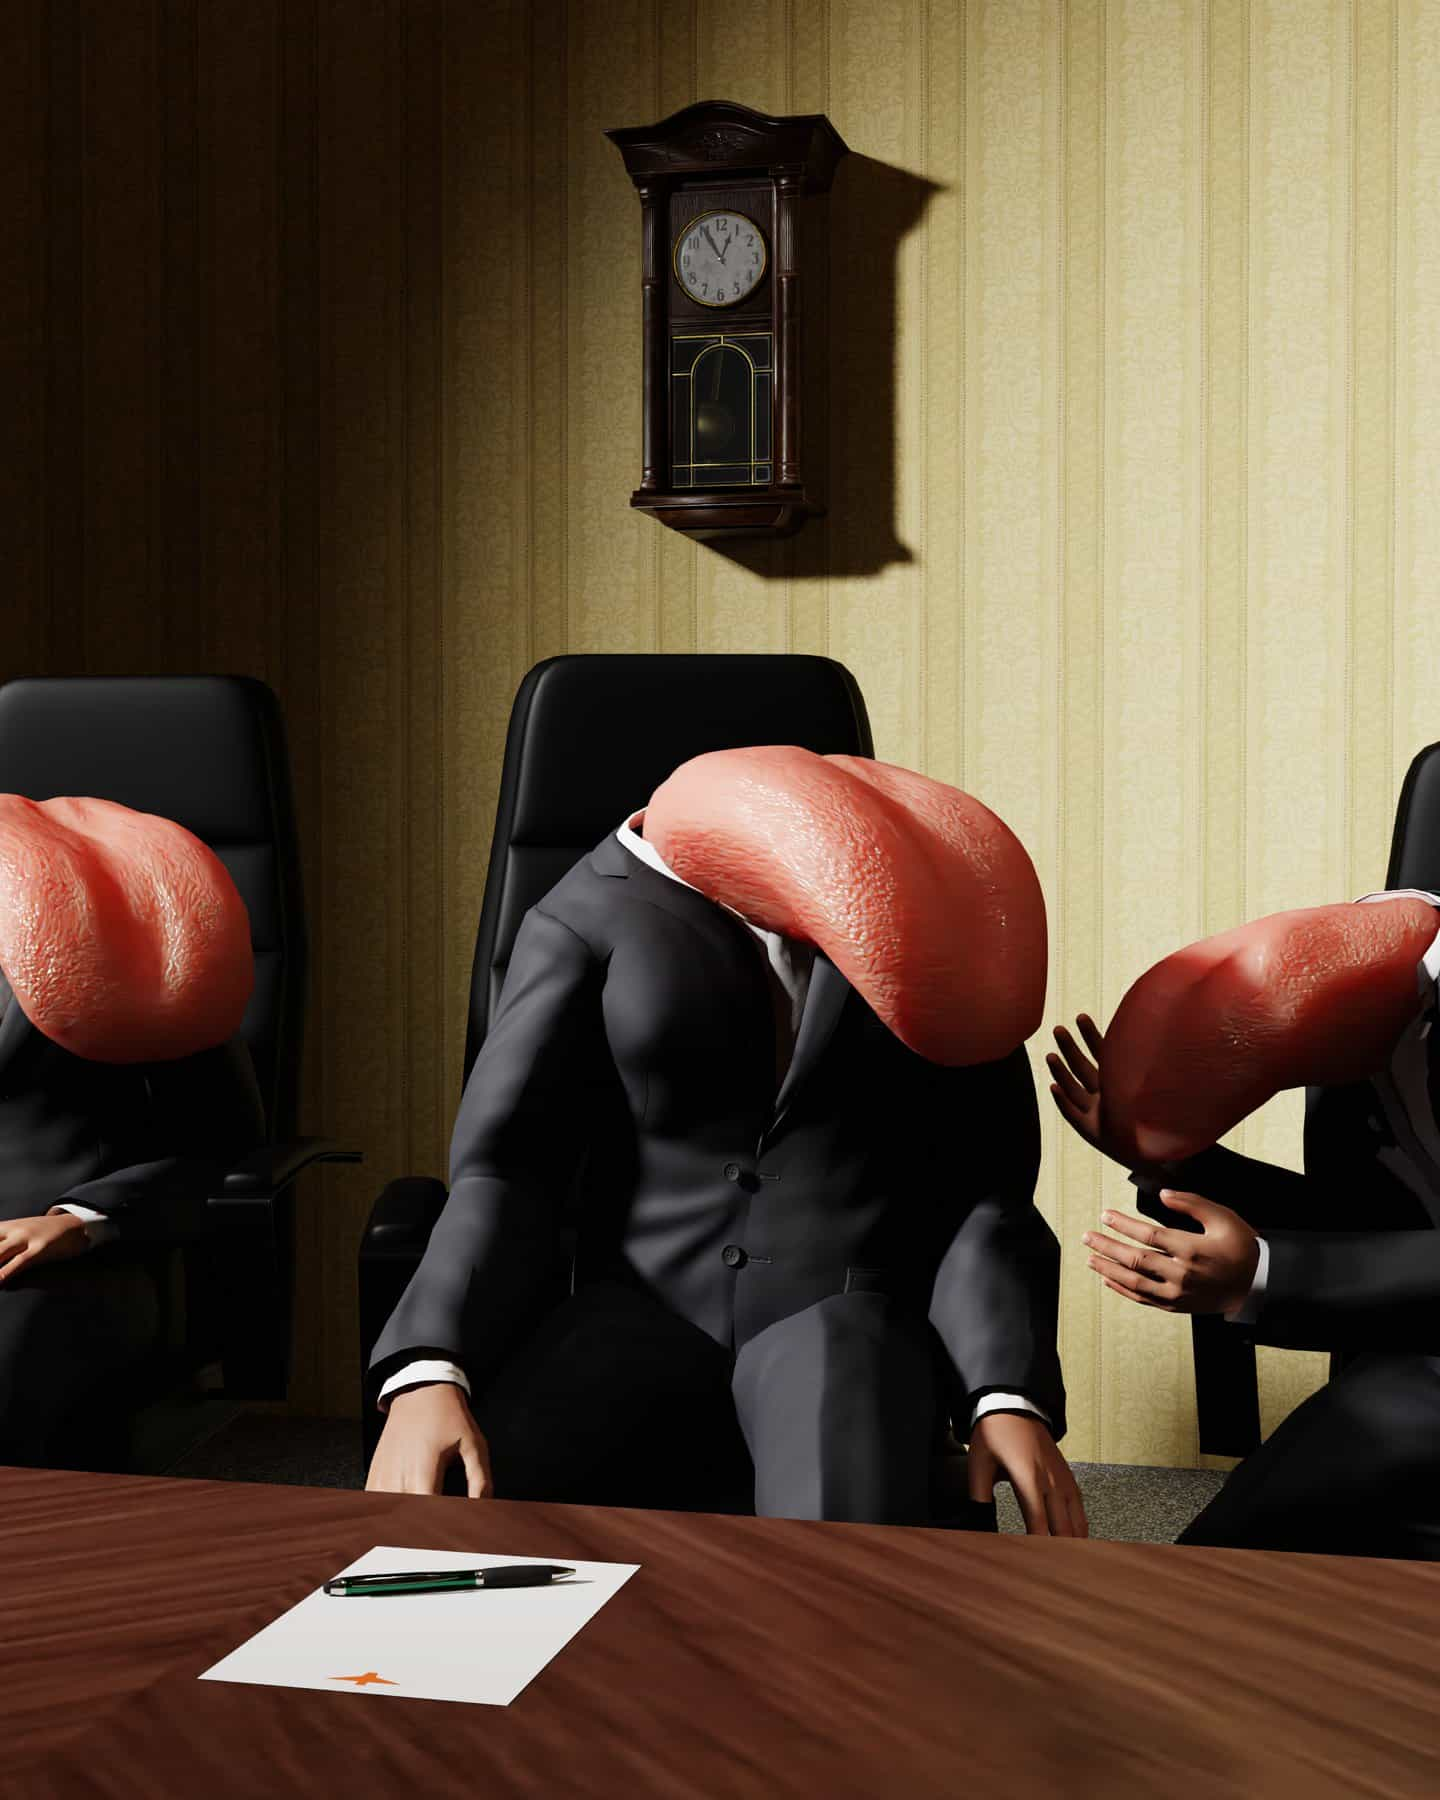 Saratta Chuengsatiansup convierte titulares deprimentes en renders surrealistas